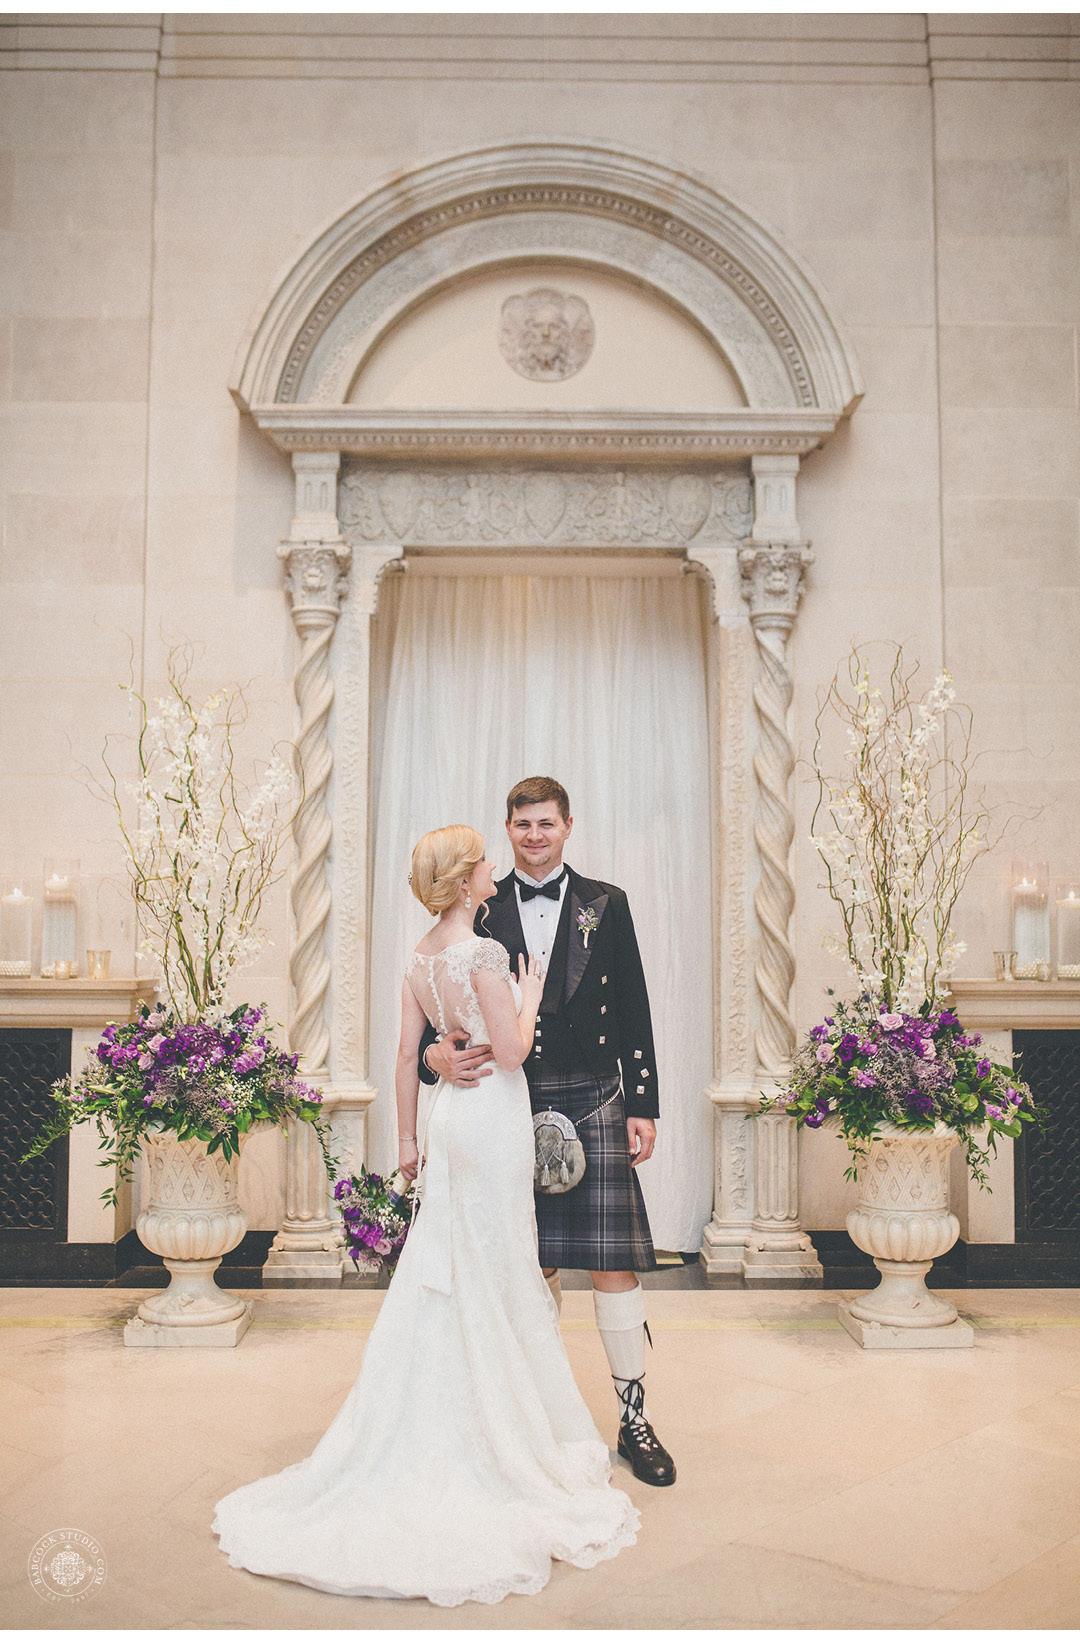 april-jared-wedding-photographer-dayton-ohio-19.jpg